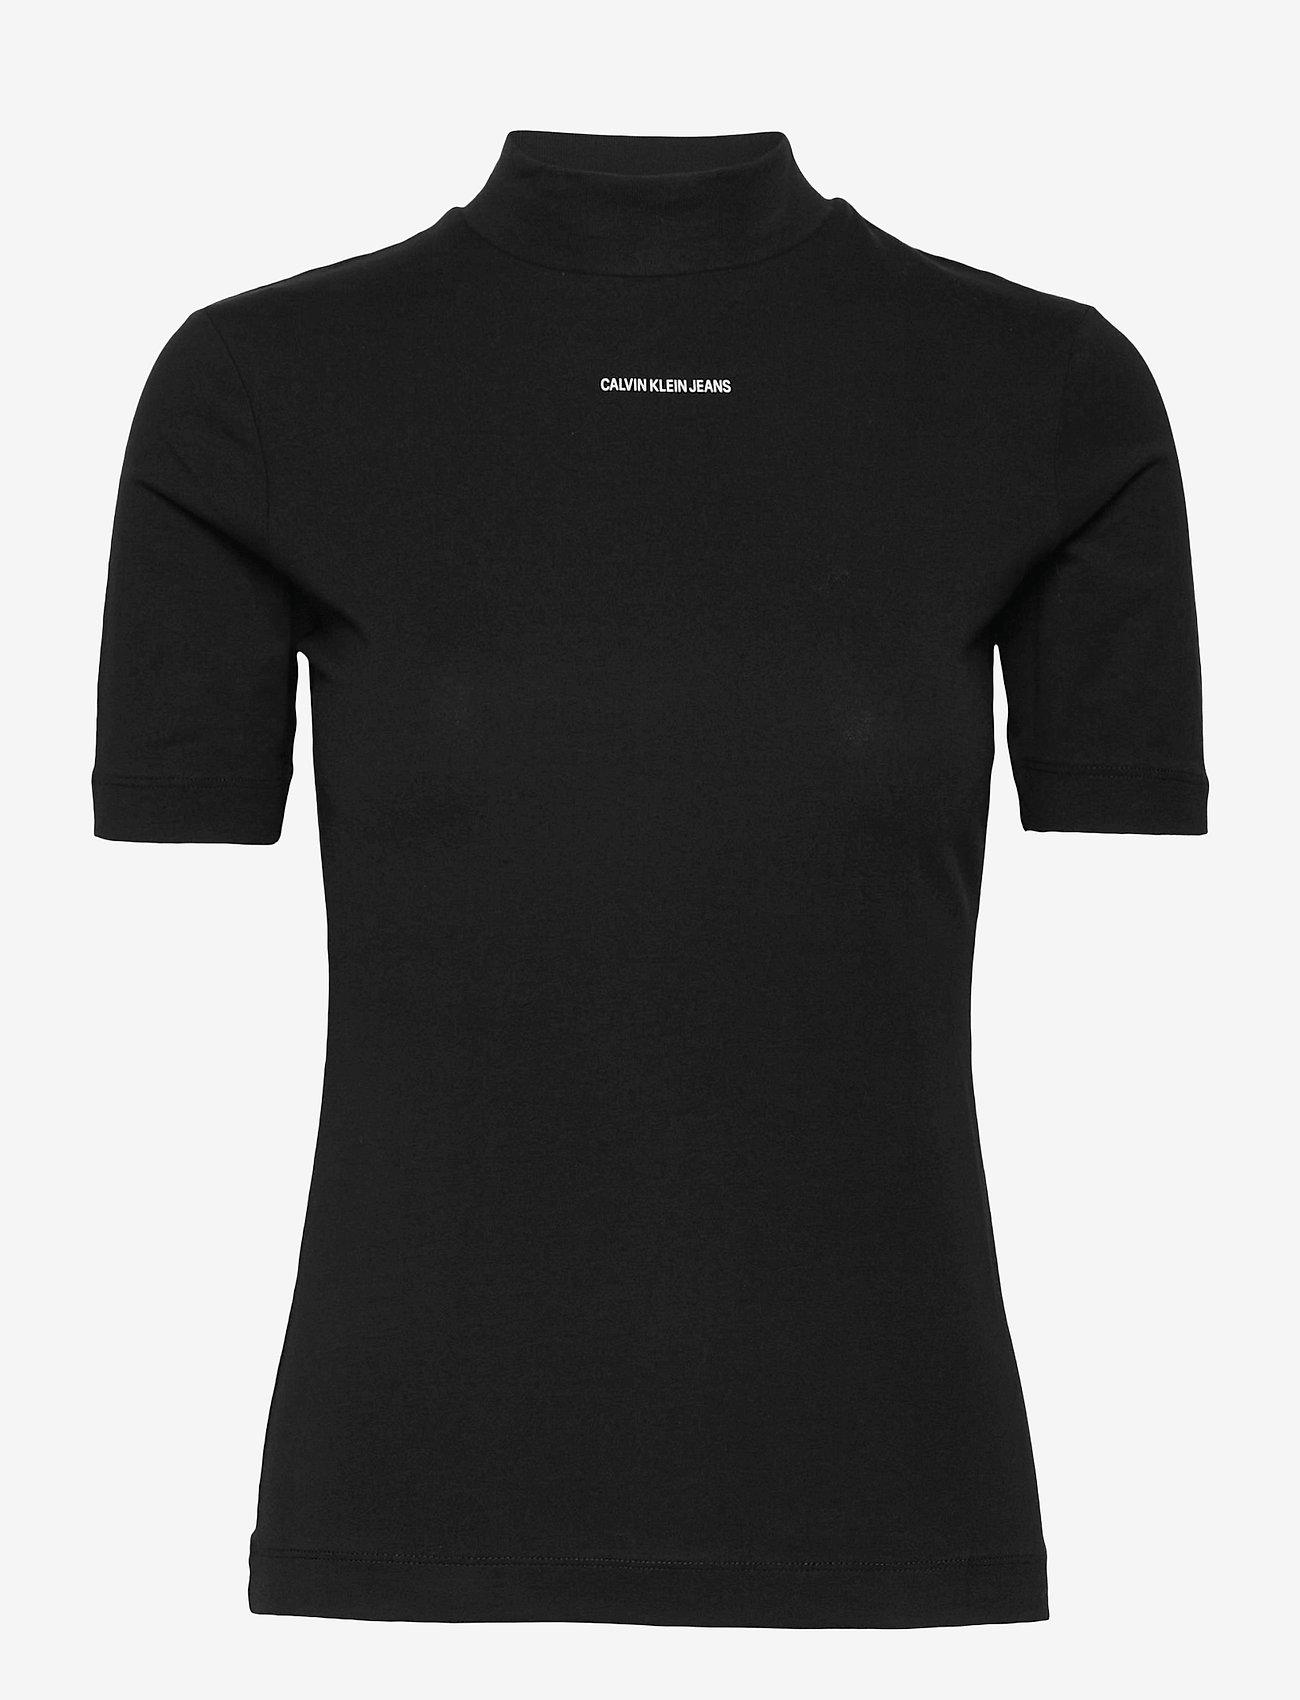 Calvin Klein Jeans - MICRO BRANDING STRETCH MOCK NECK - t-shirts - ck black - 0